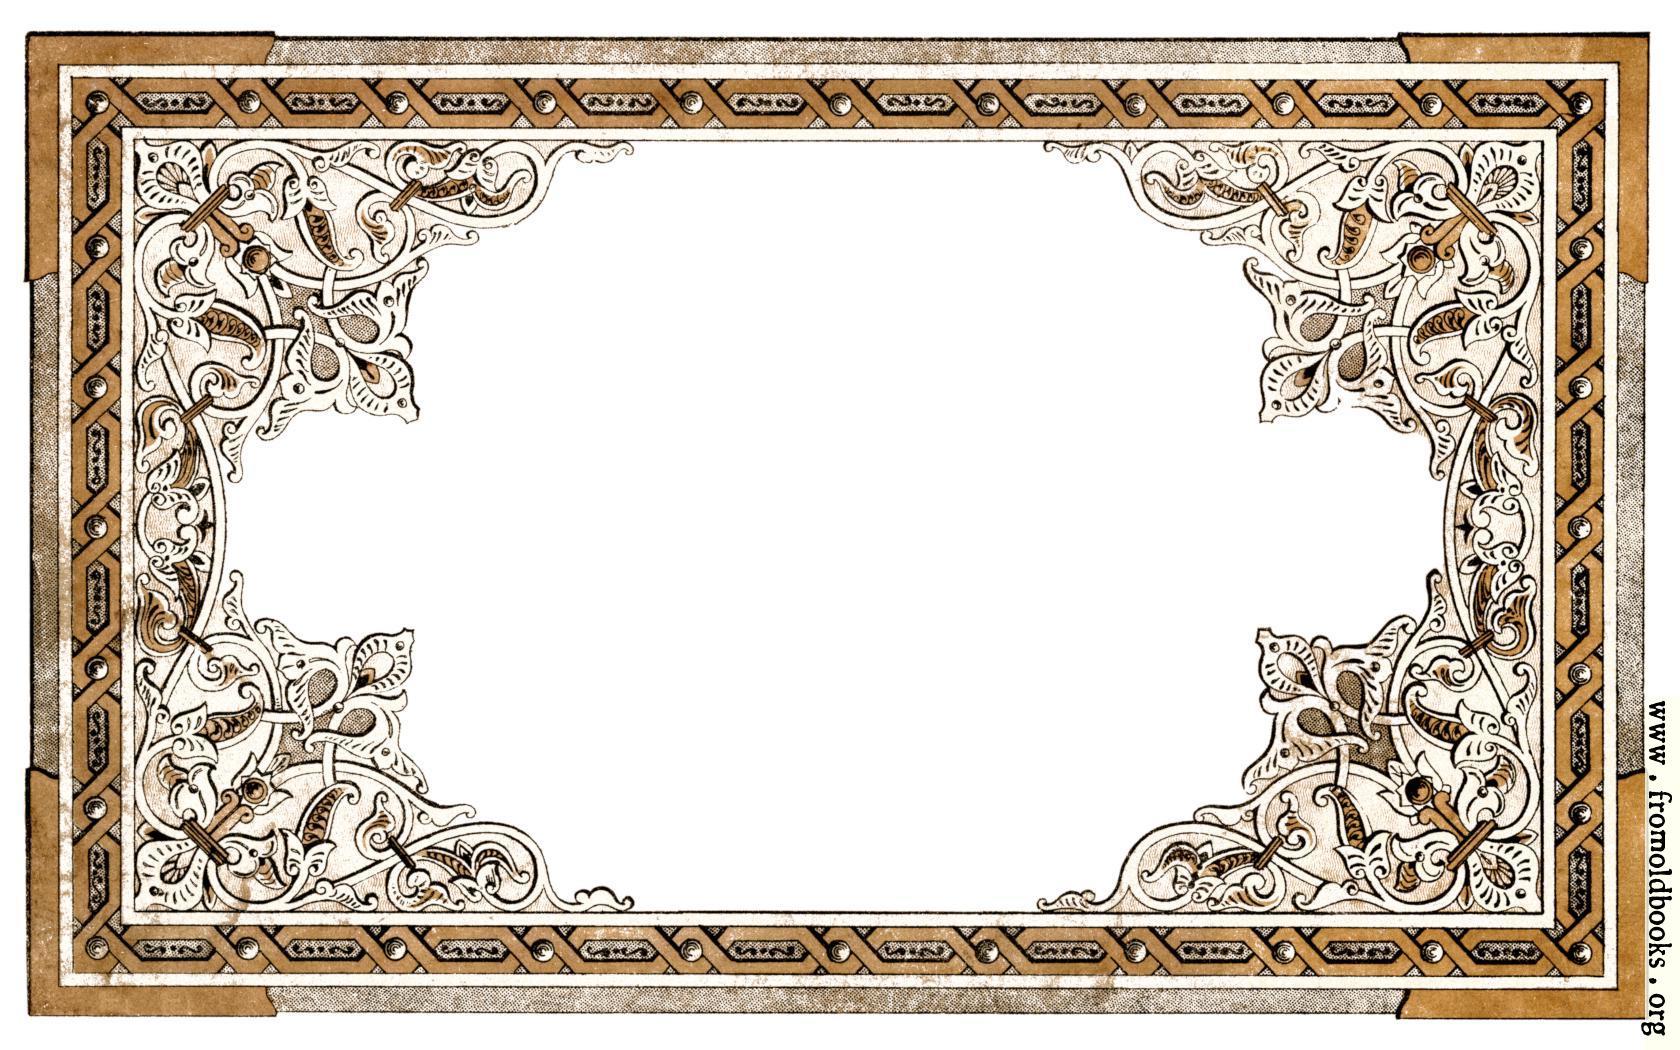 Vintage shabby-chic ornate full-page border